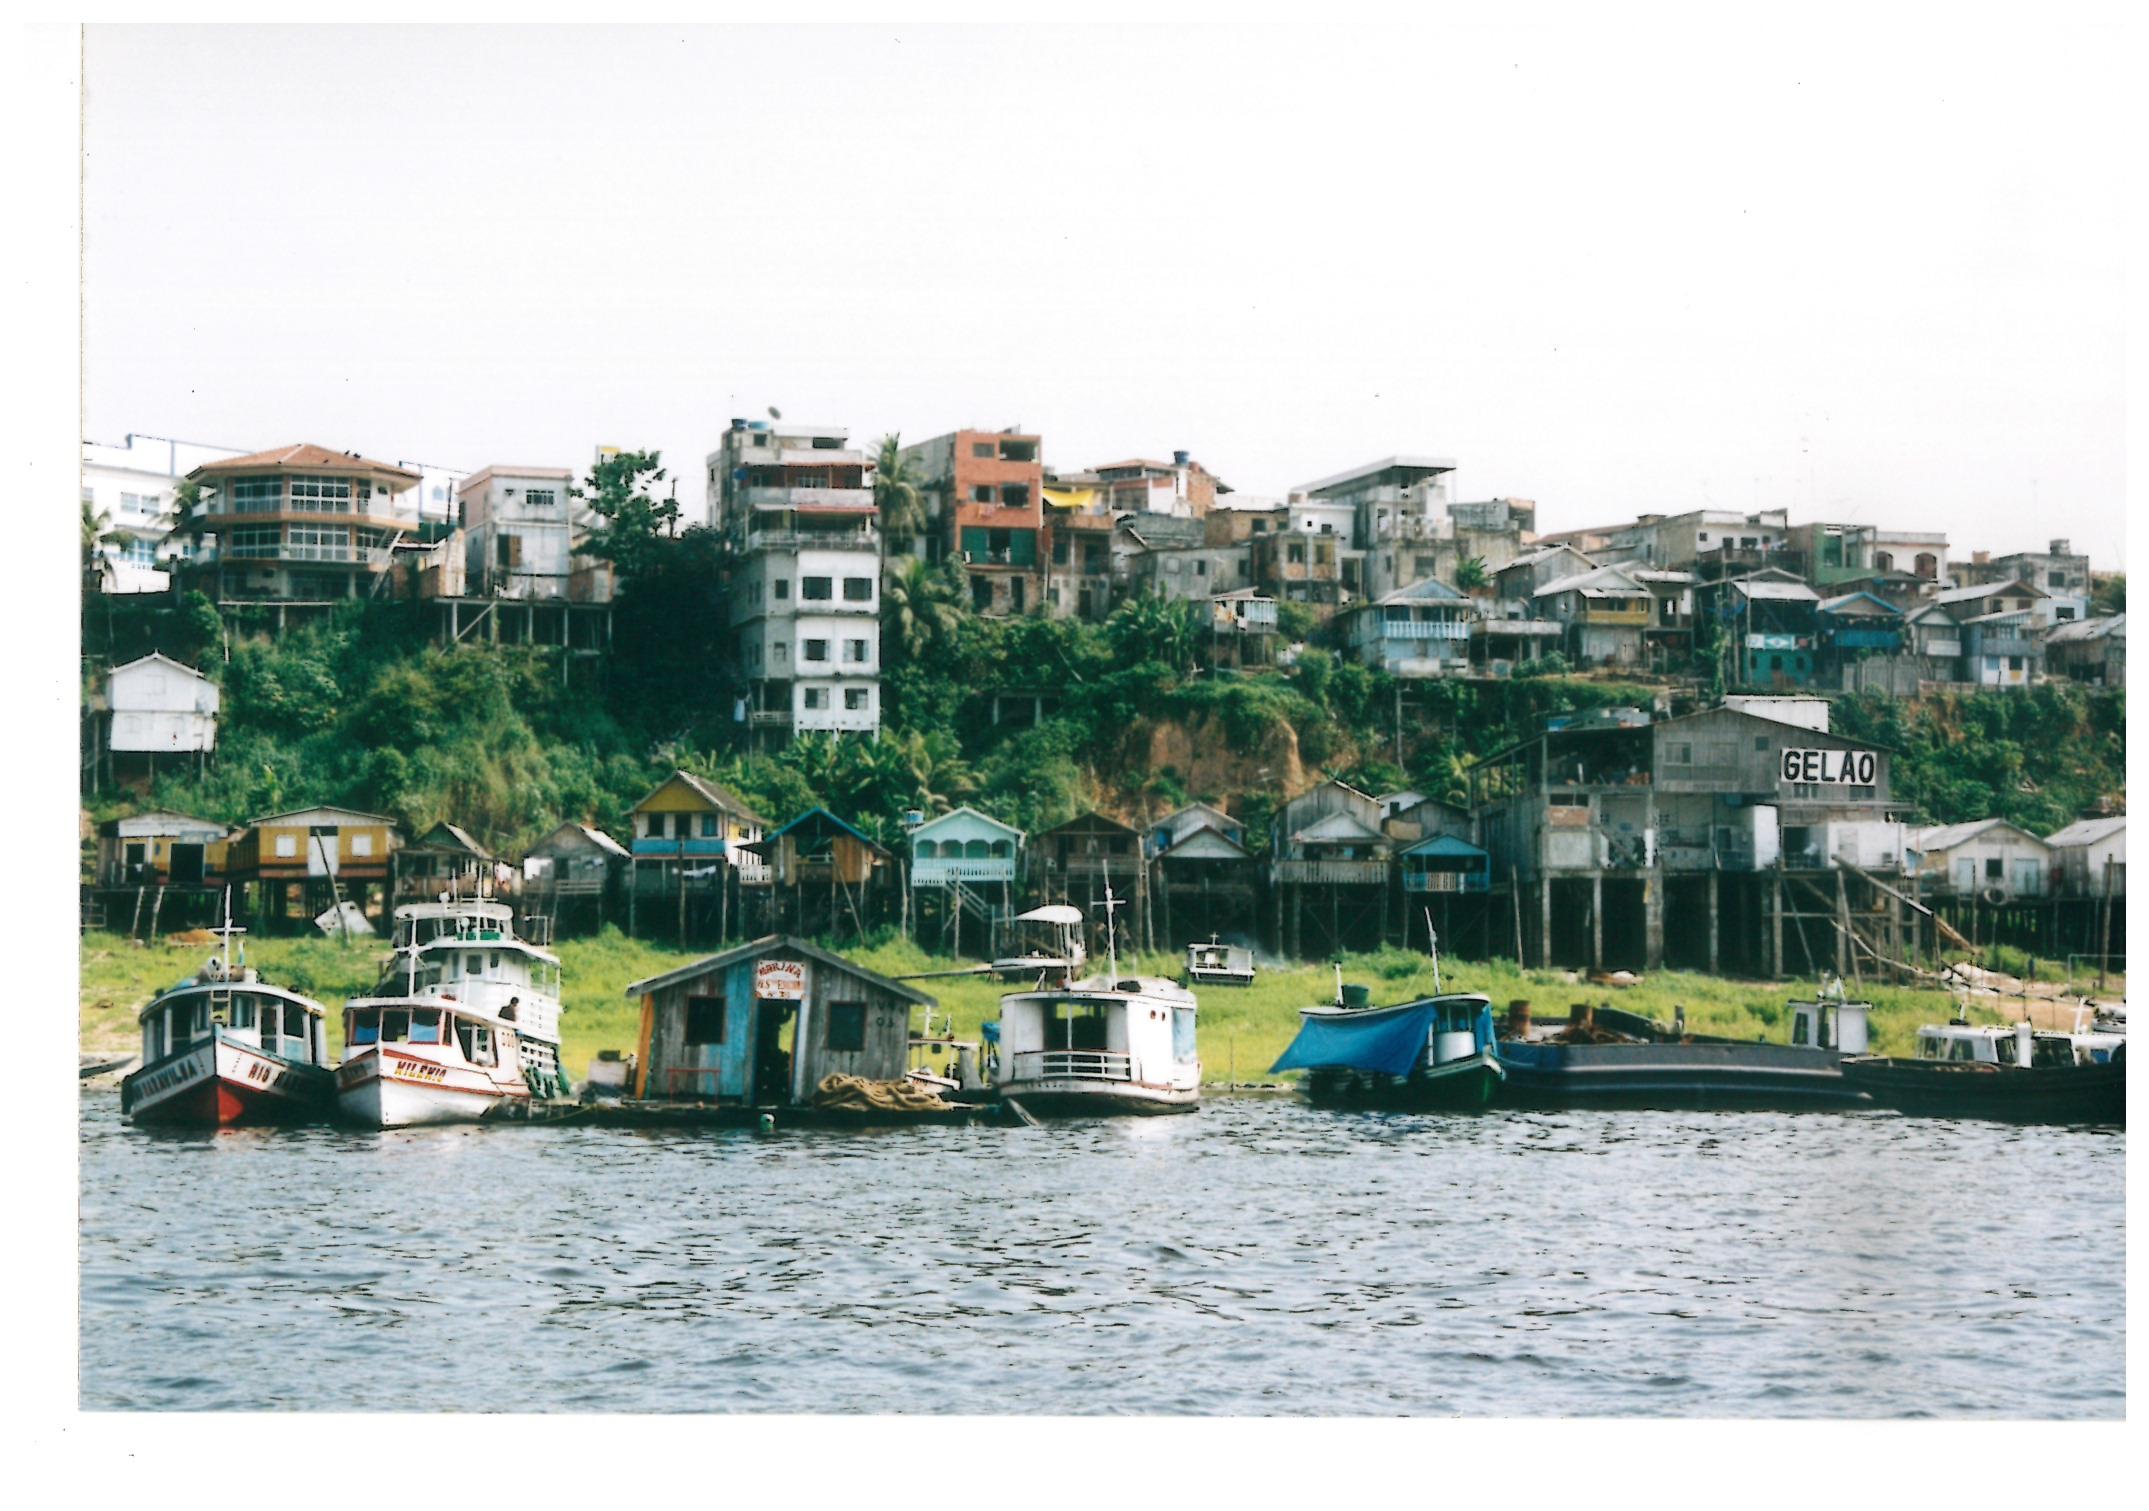 Brasile Rio amazzoni 2003 2